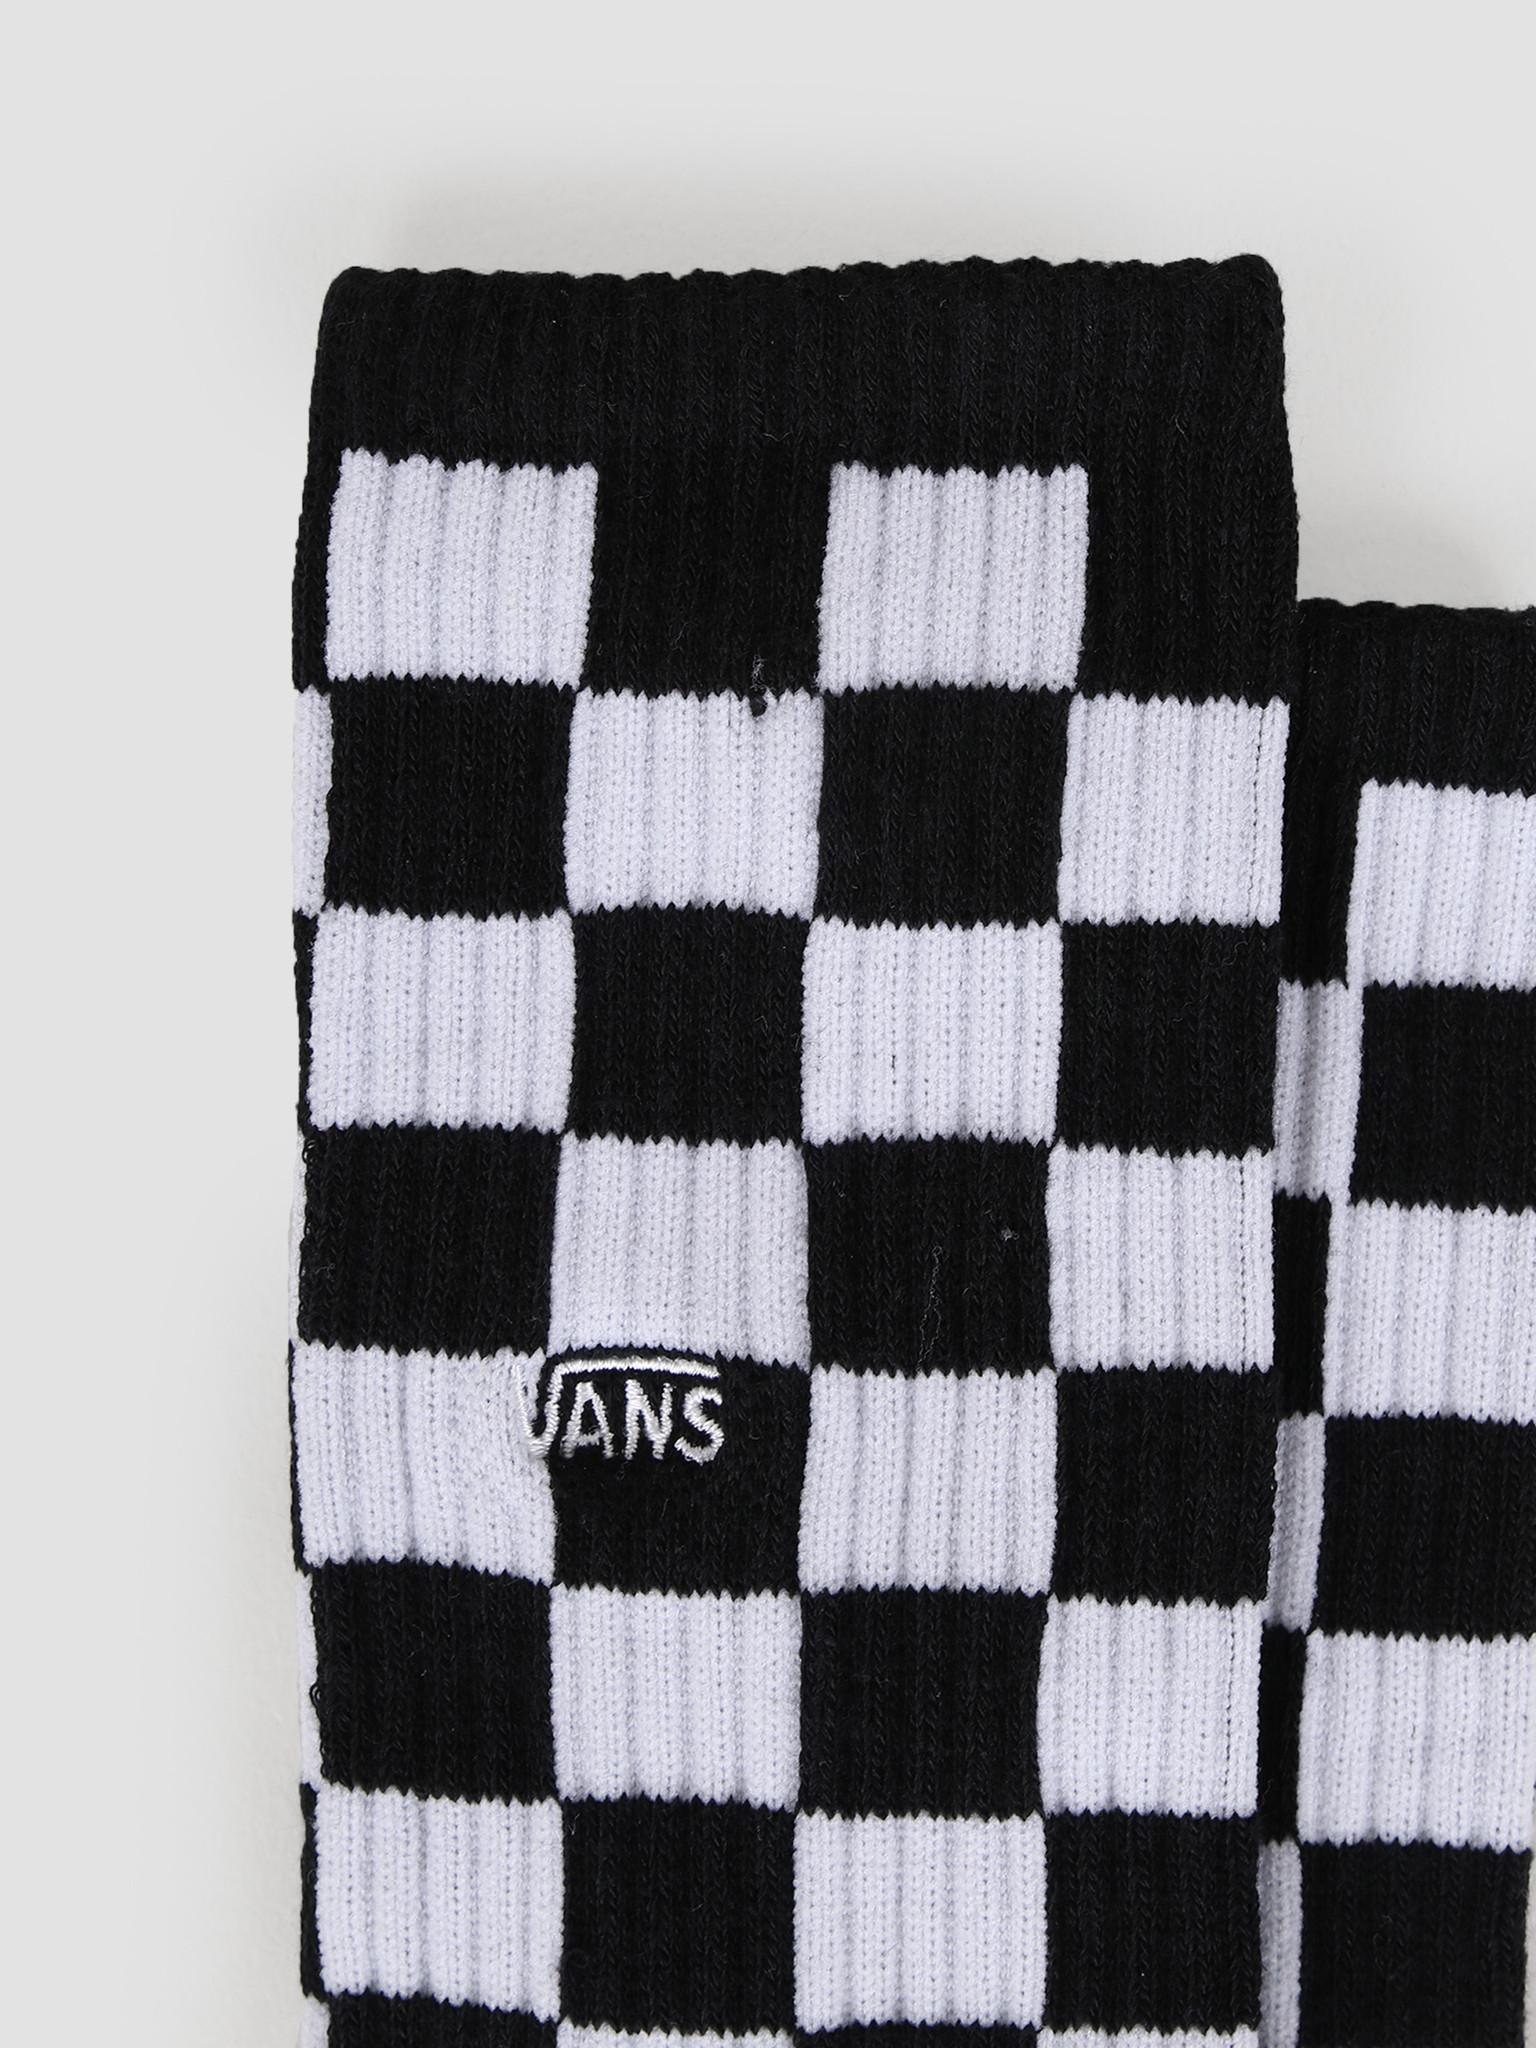 Vans Vans Checkerboard Crew Socks Black White VA3H3OHU0